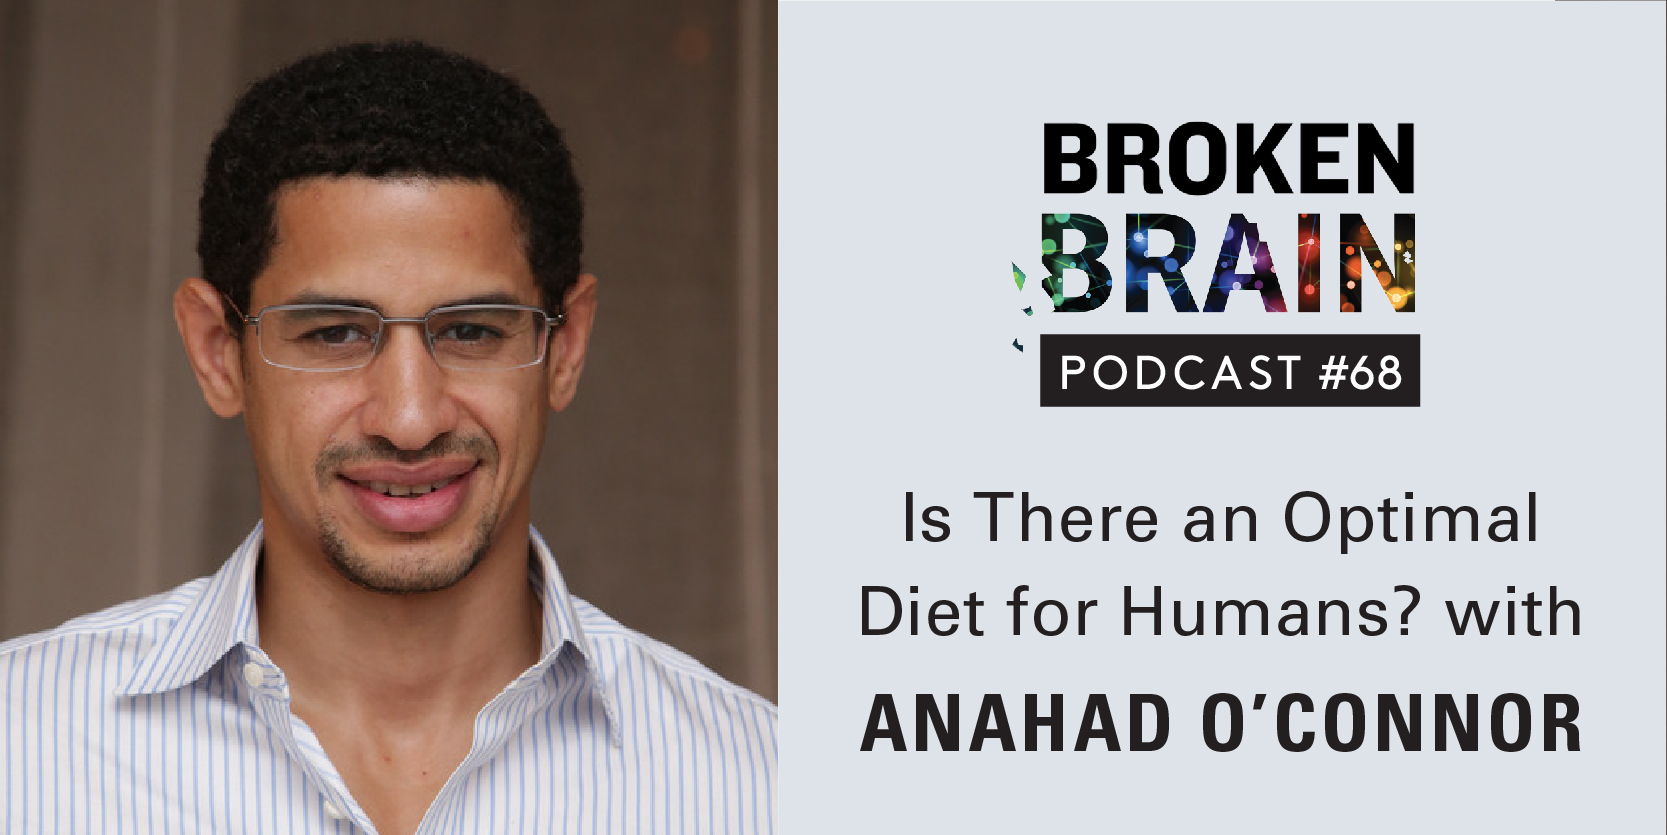 Broken Brain Podcasts - Dr  Mark Hyman